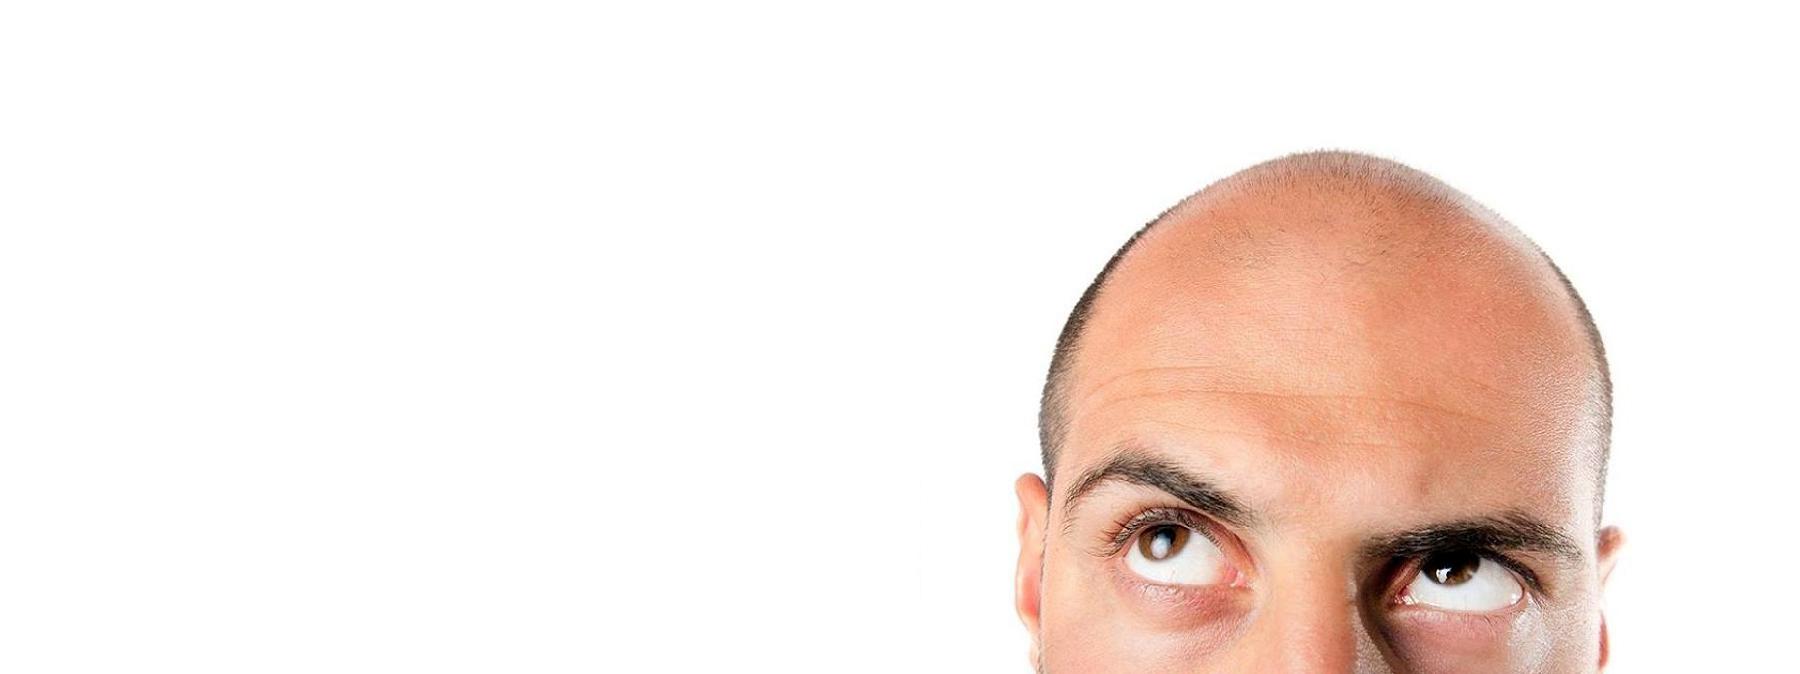 Micropigmentation - Restore Your Hairline